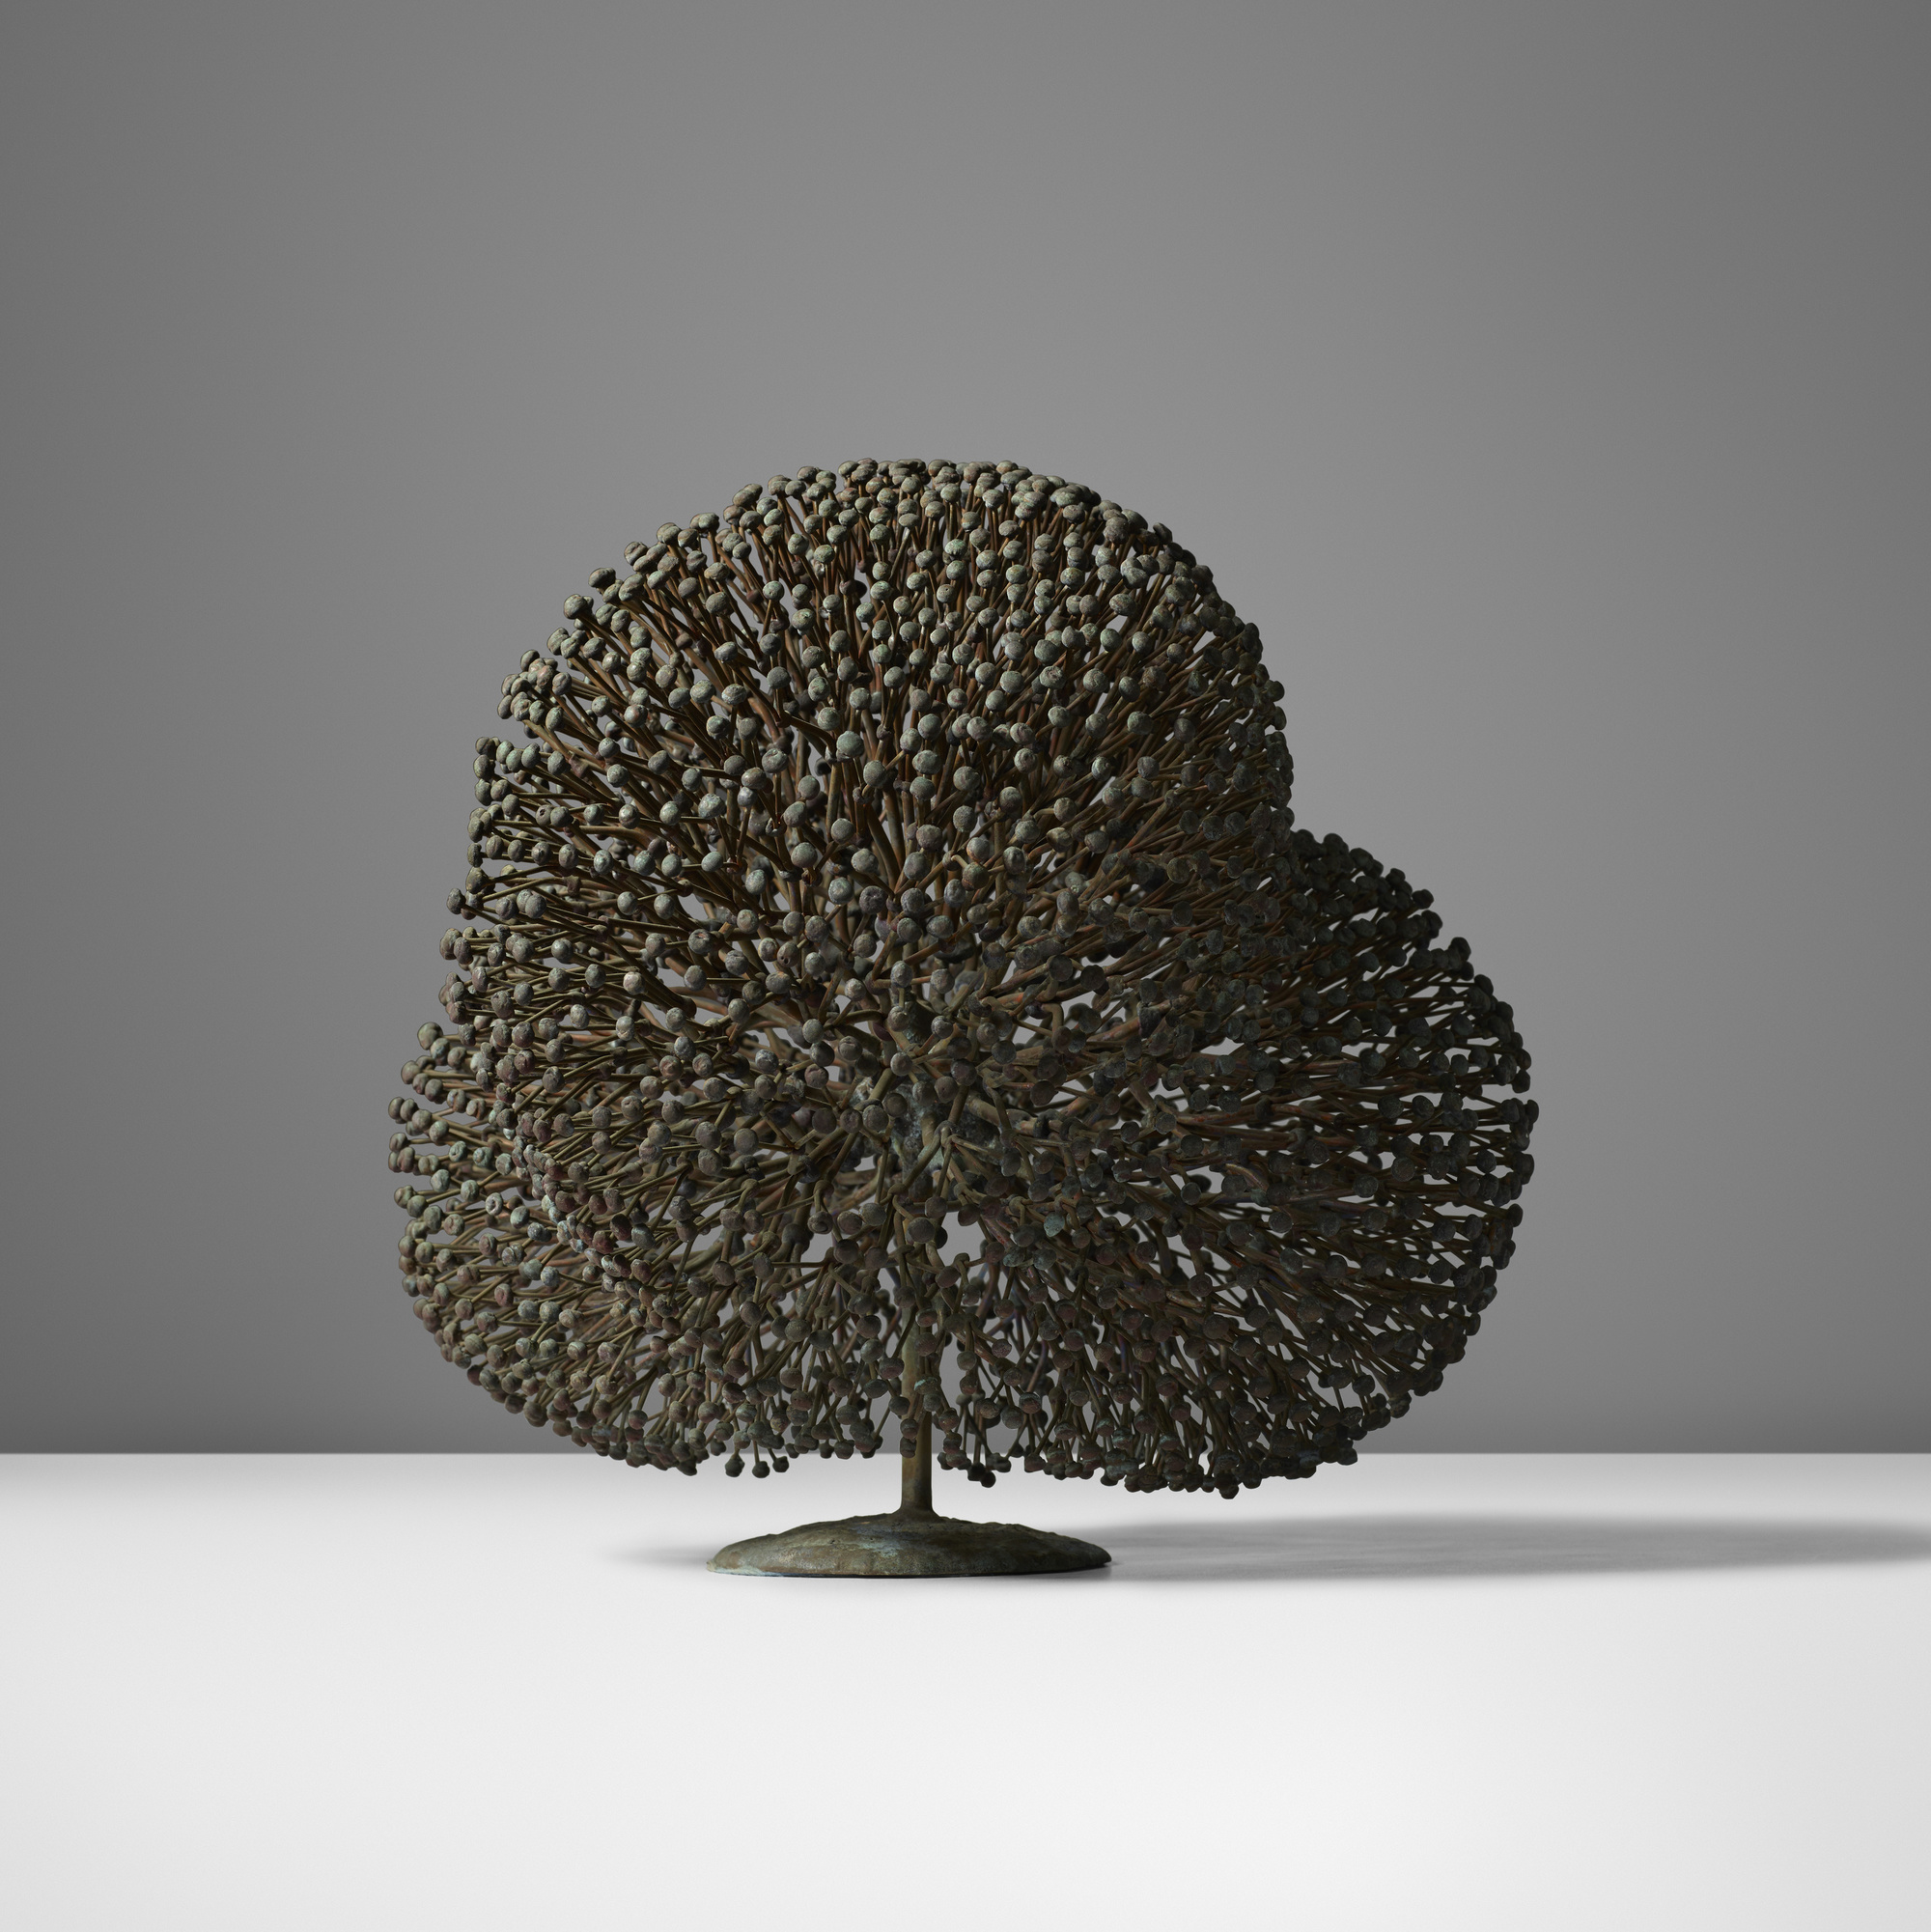 14: Harry Bertoia / Untitled (Bush Form) (3 of 3)